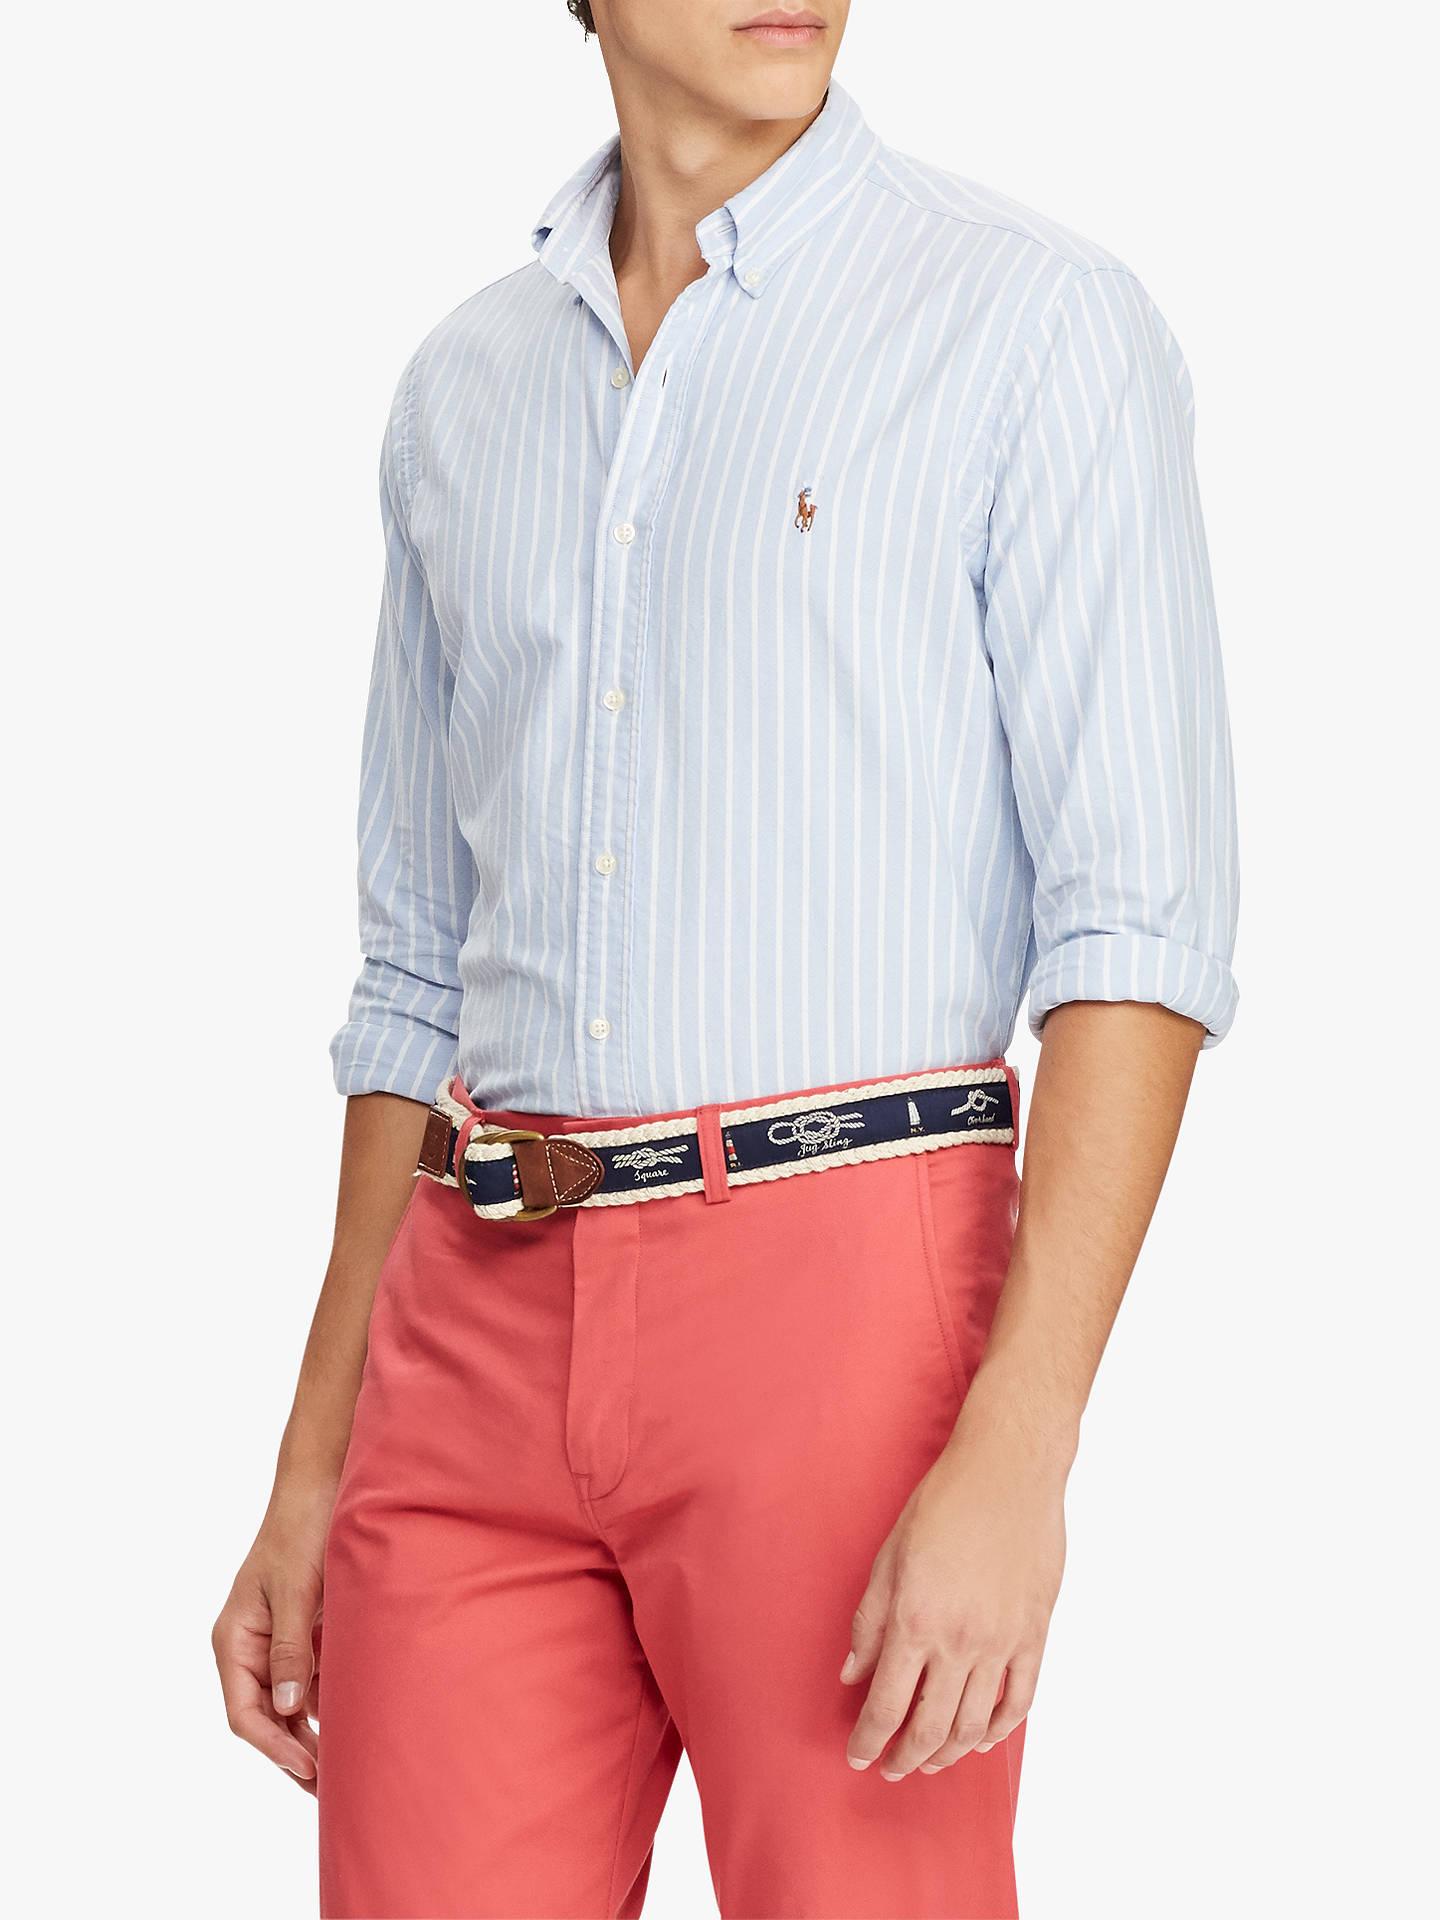 79ac7b471bce Polo Ralph Lauren Striped Oxford Shirt at John Lewis   Partners